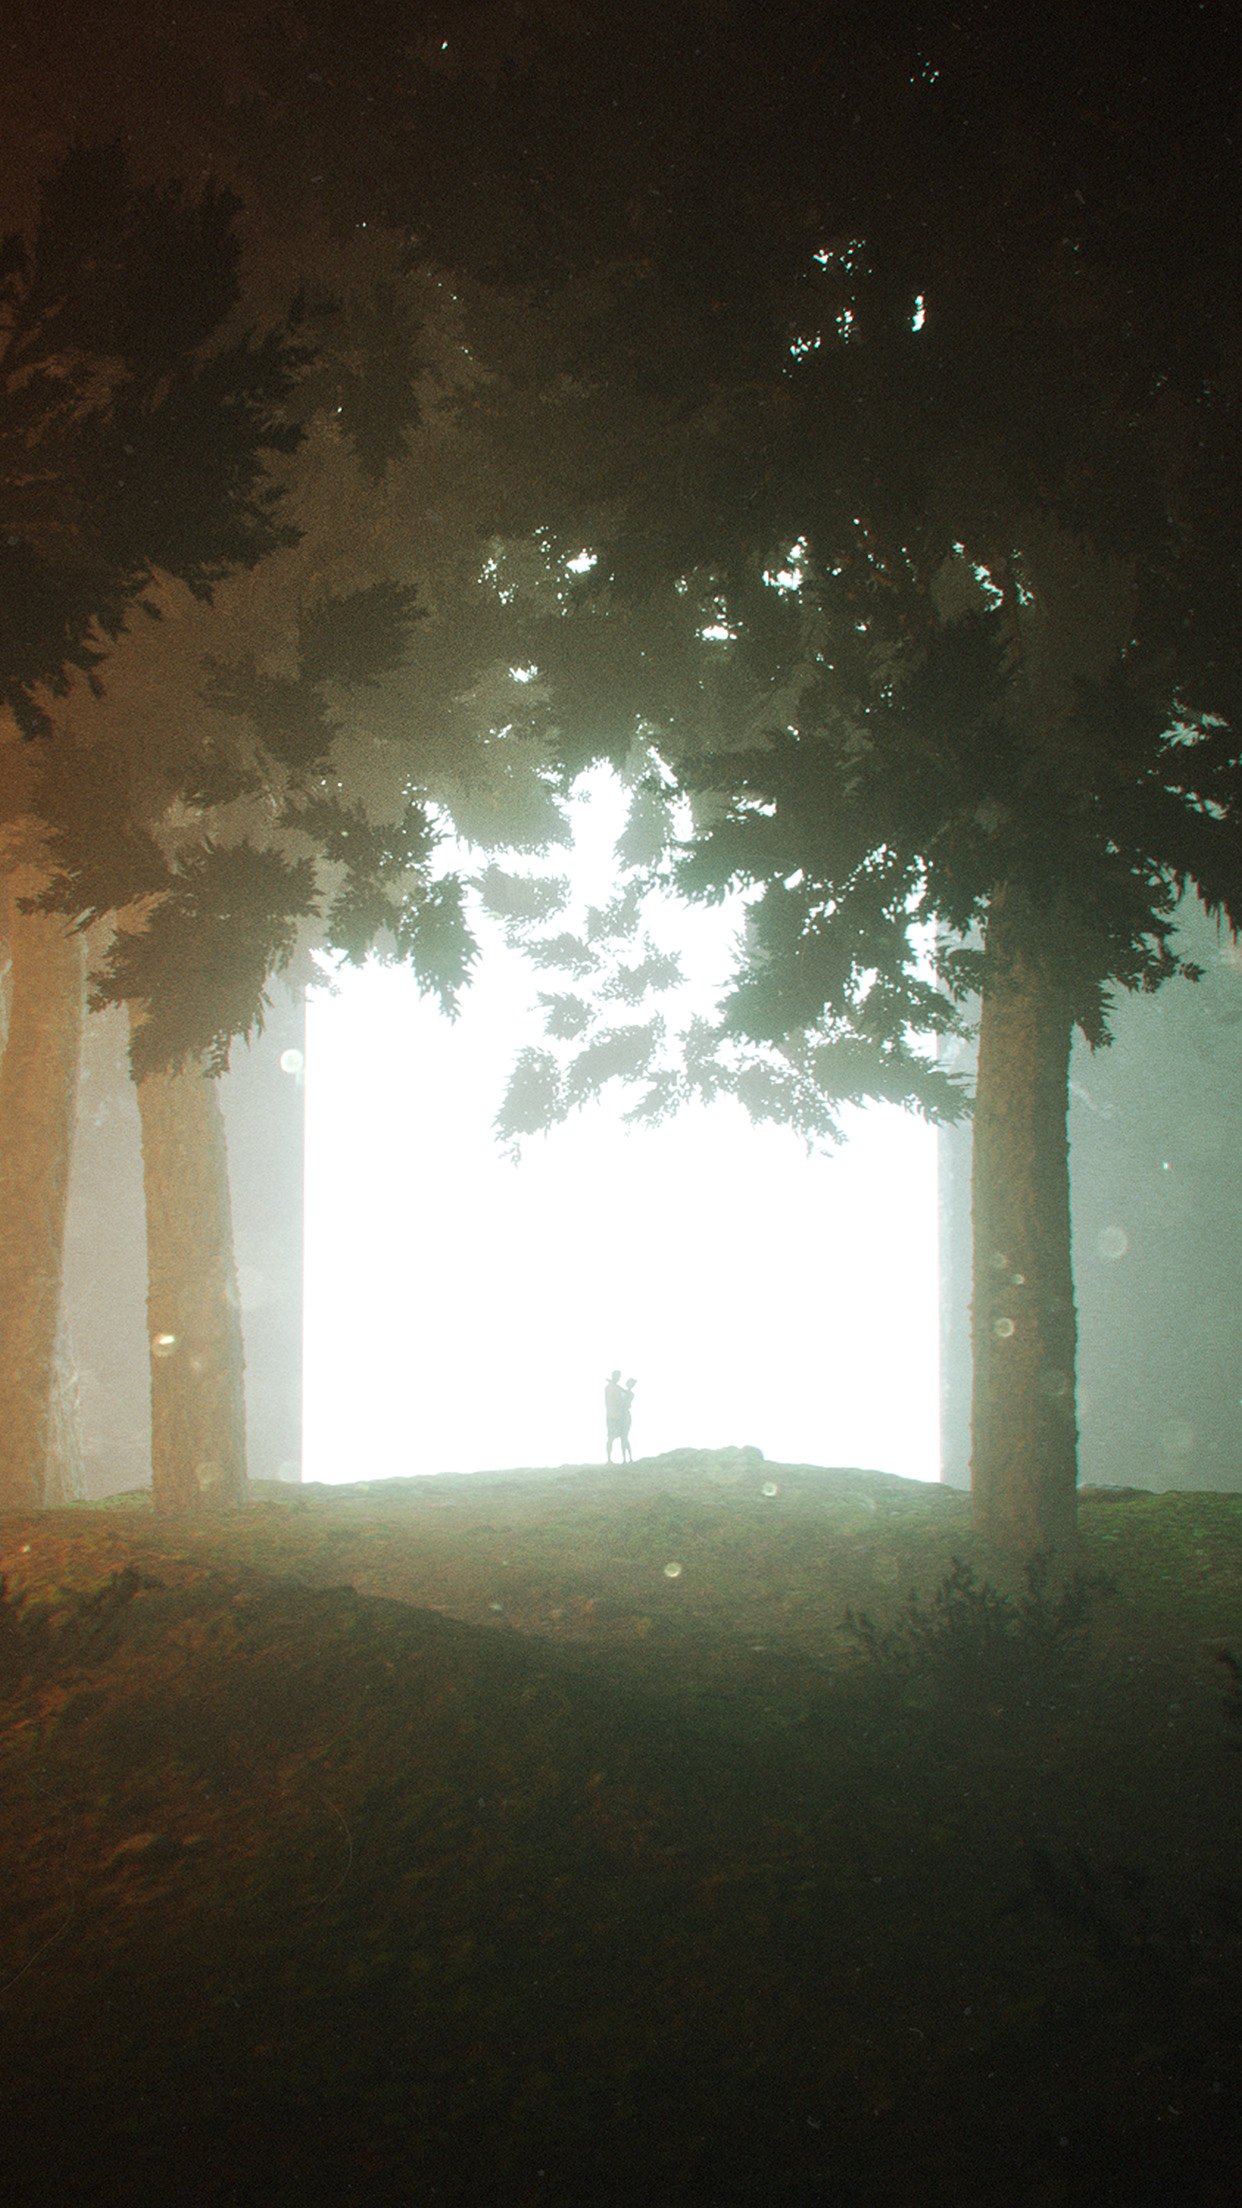 be06-stuart-space-tree-couple-fantasy-art-illustration ...